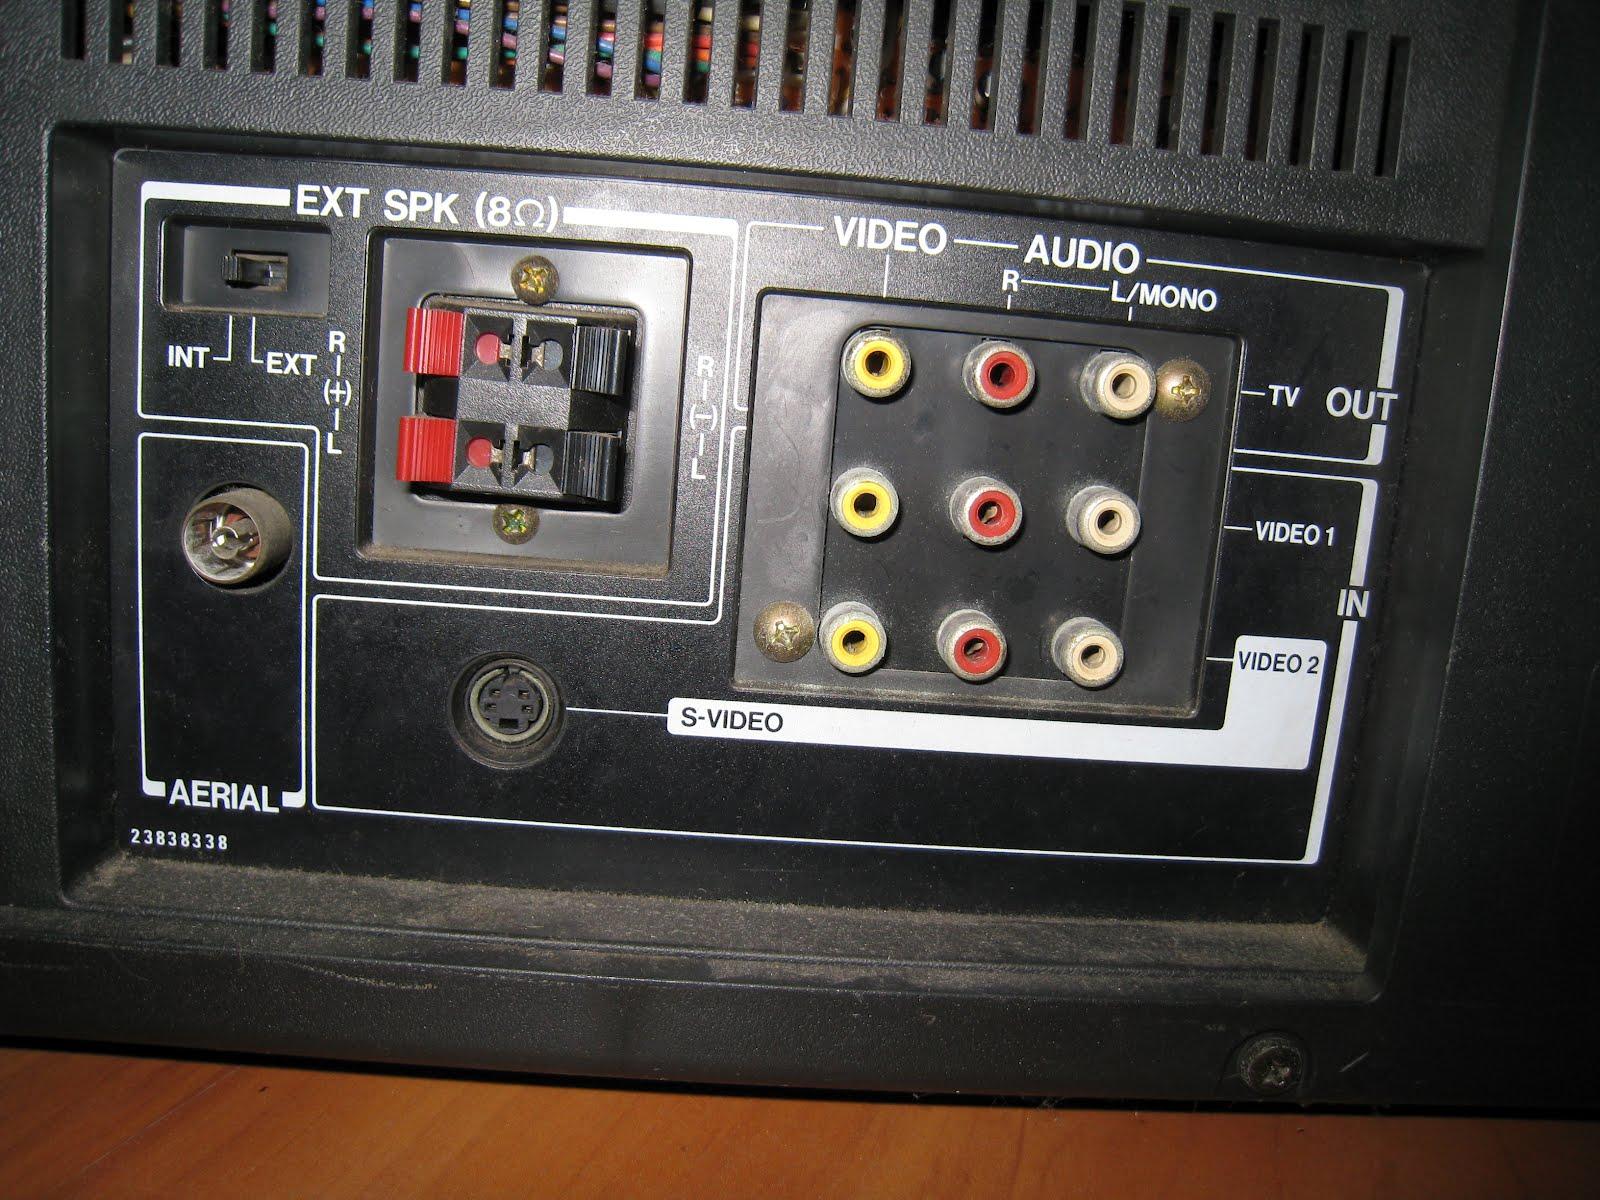 My Zakka Shop Used Toshiba Crt 29 Inch 2909hx Tv